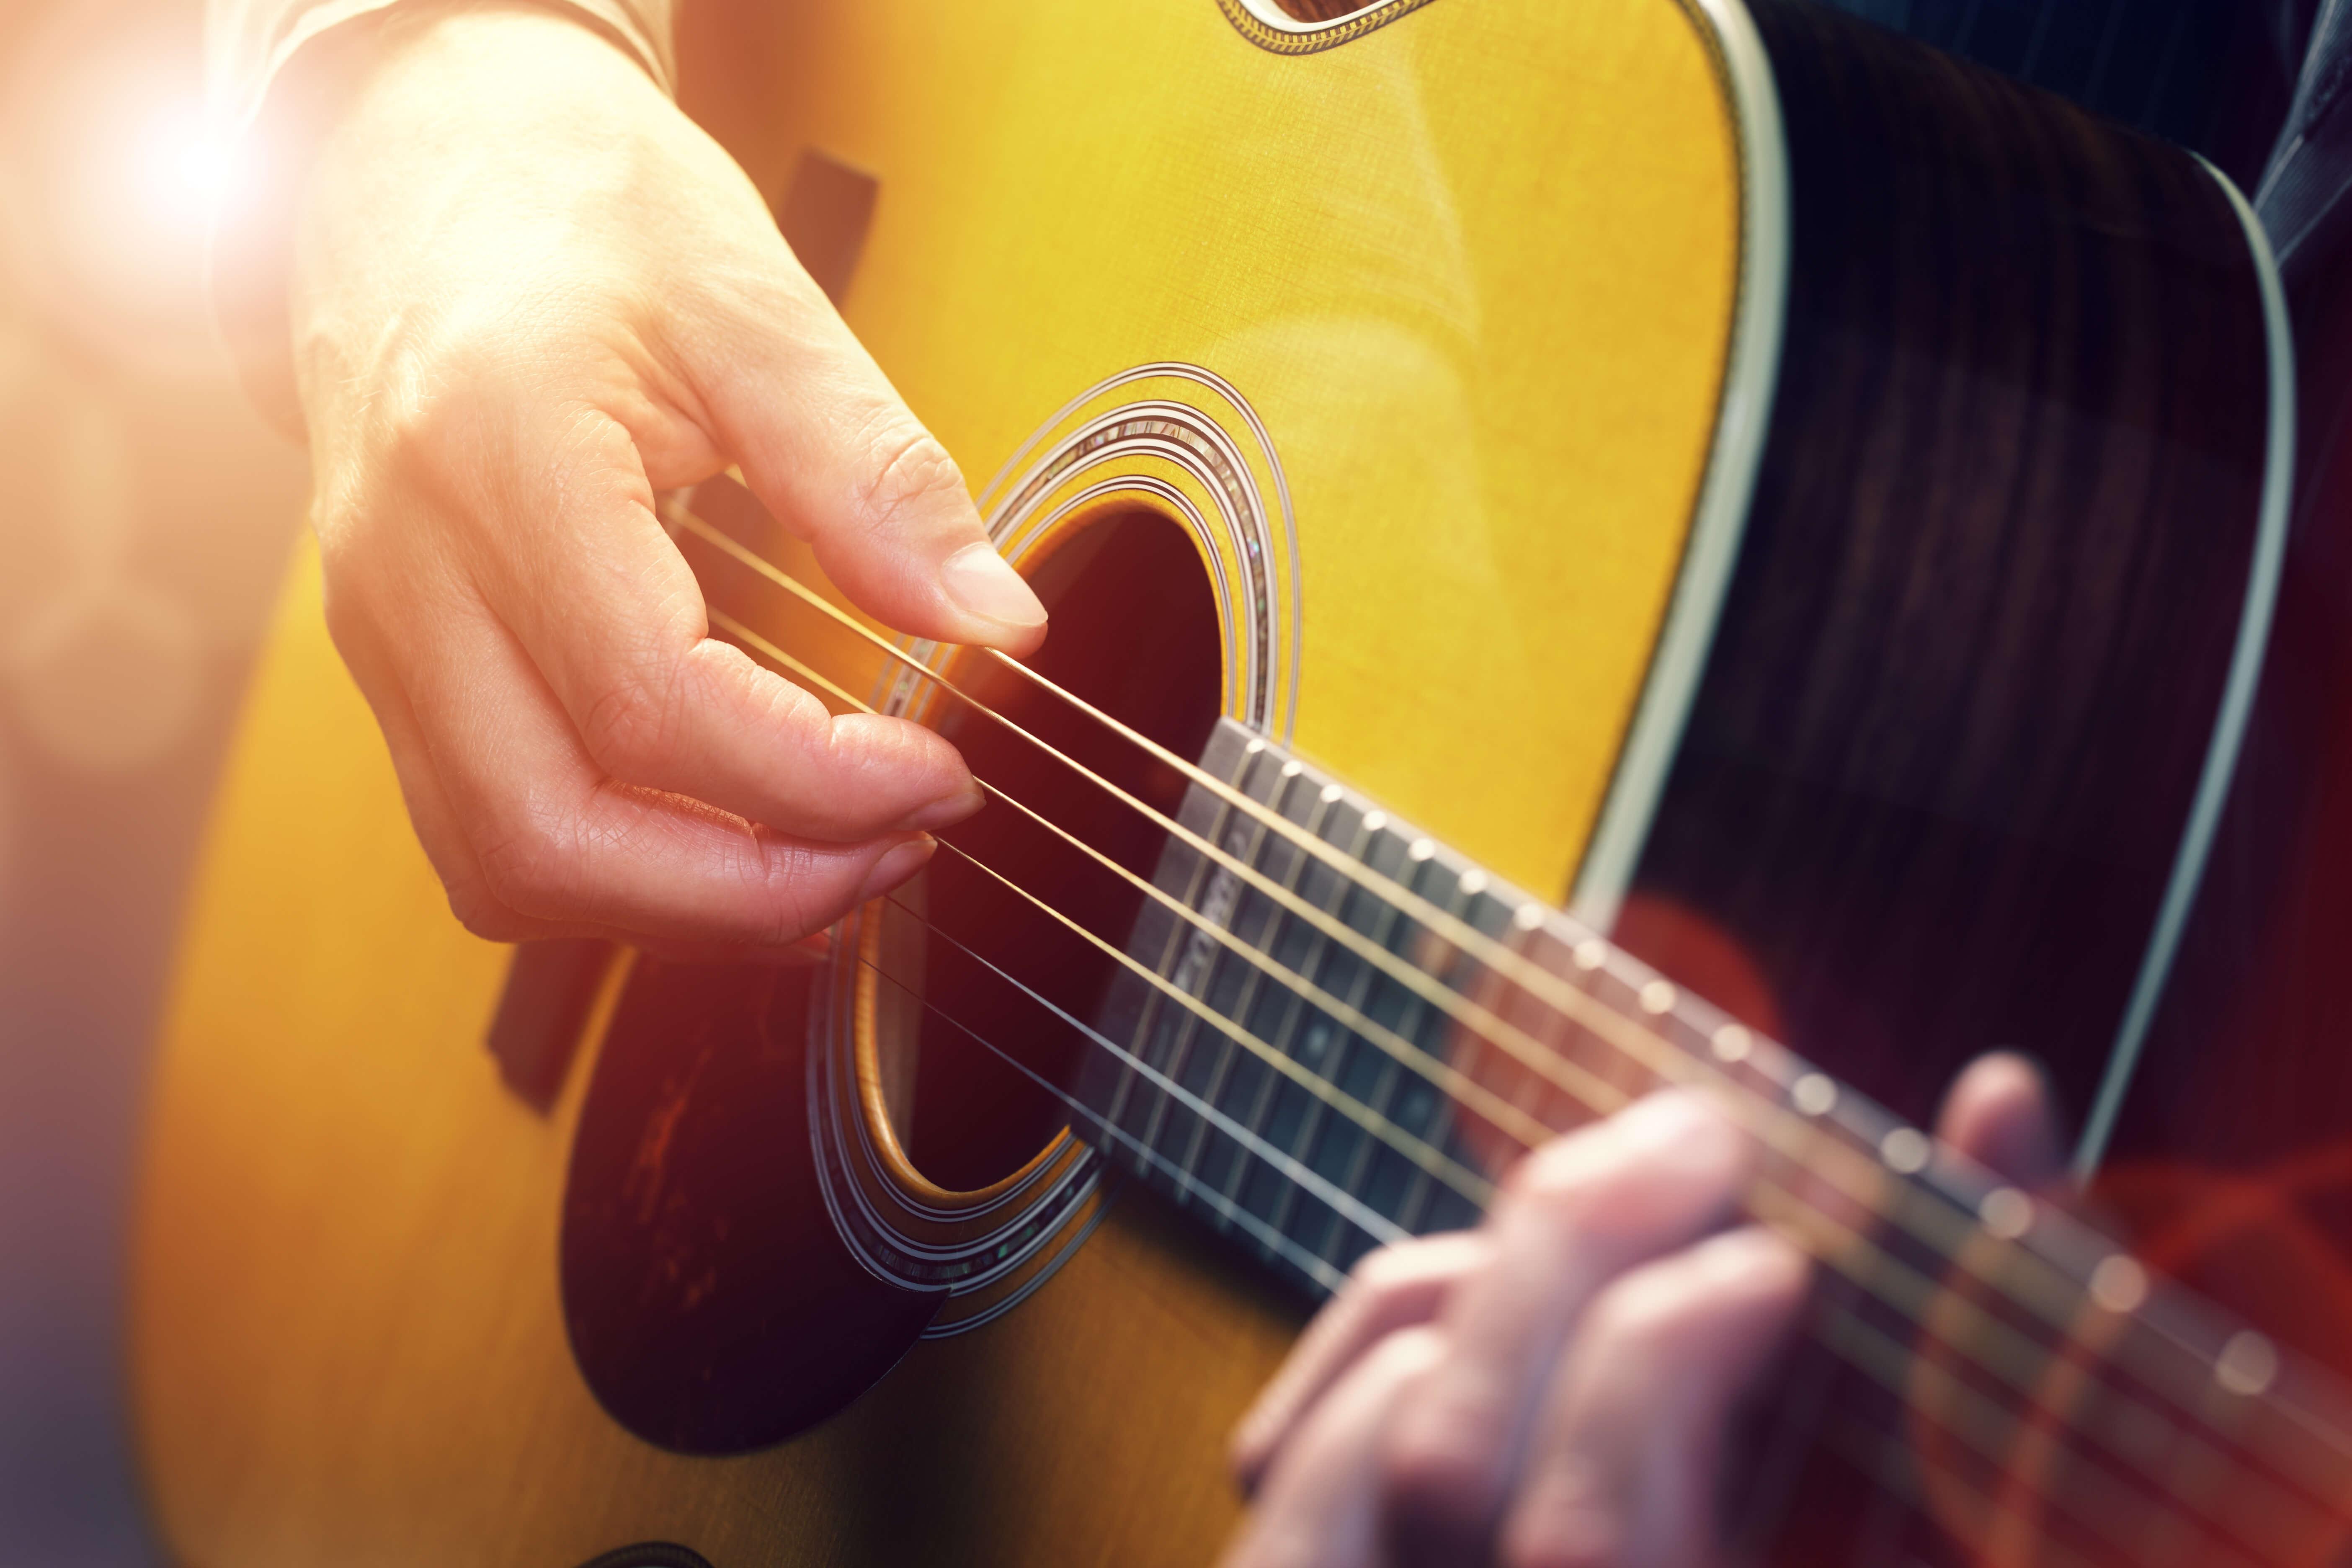 Apprendre solfège guitare